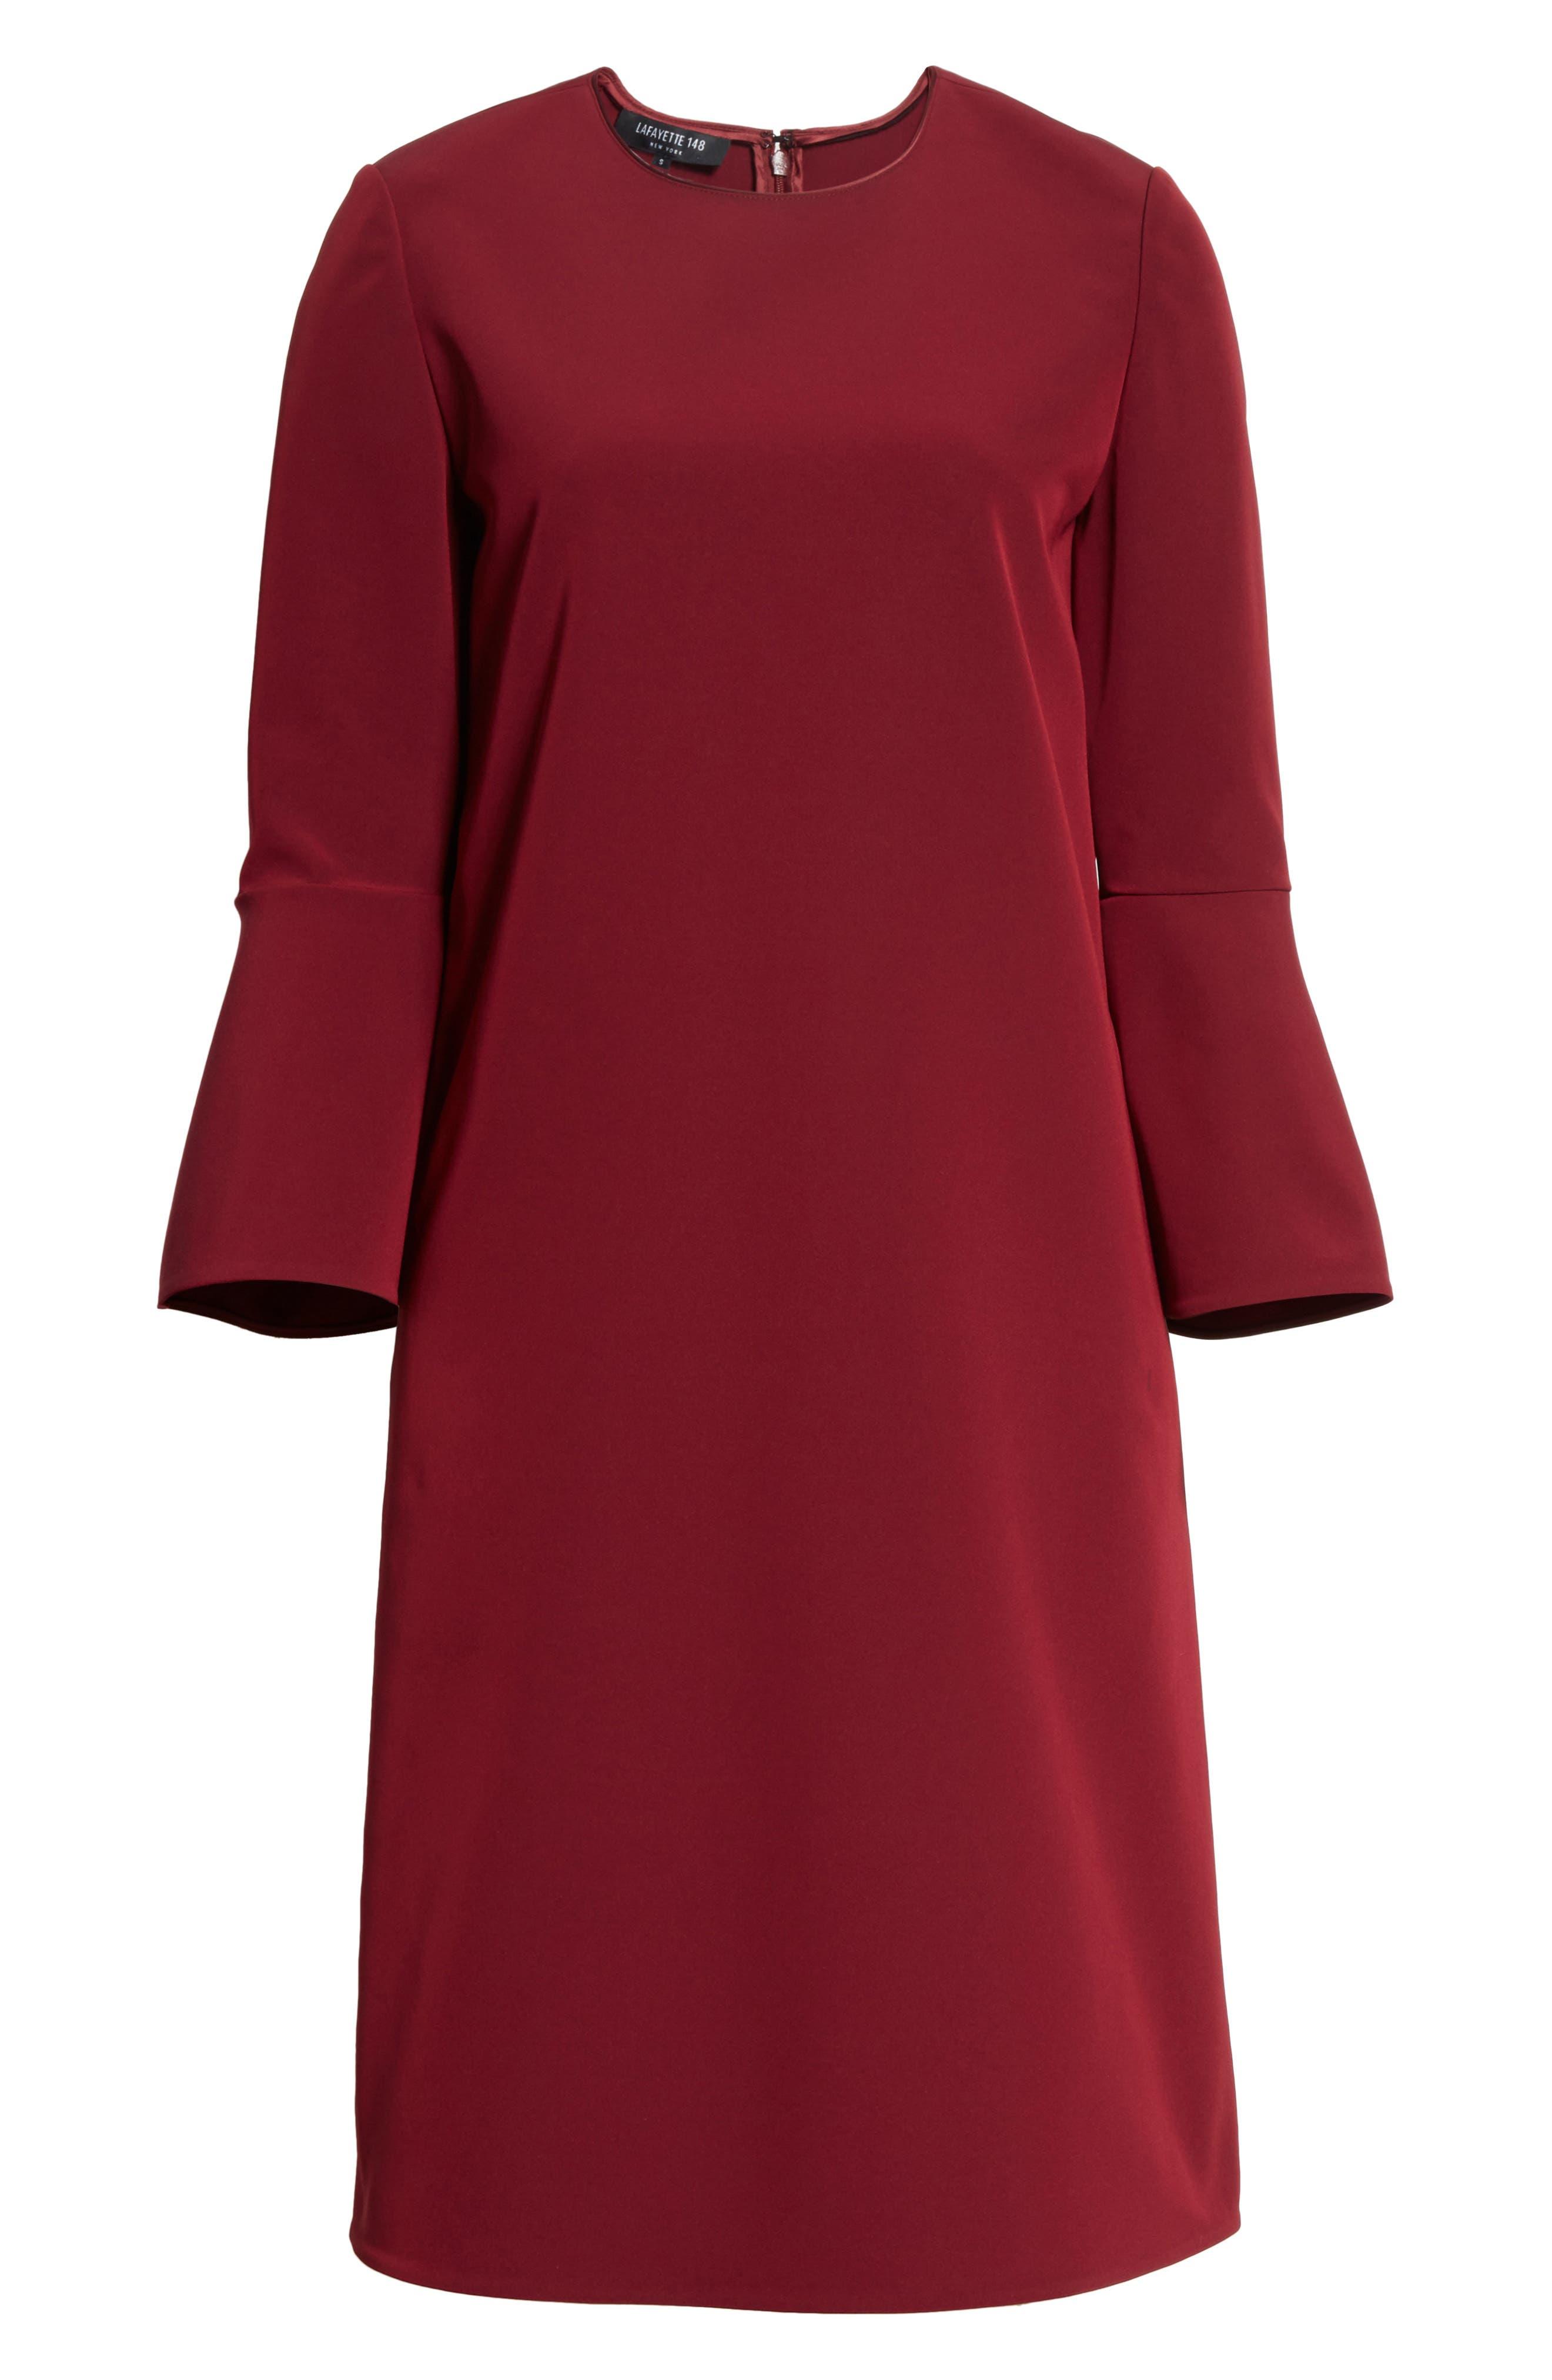 Sidra Emory Cloth Dress,                             Alternate thumbnail 6, color,                             930